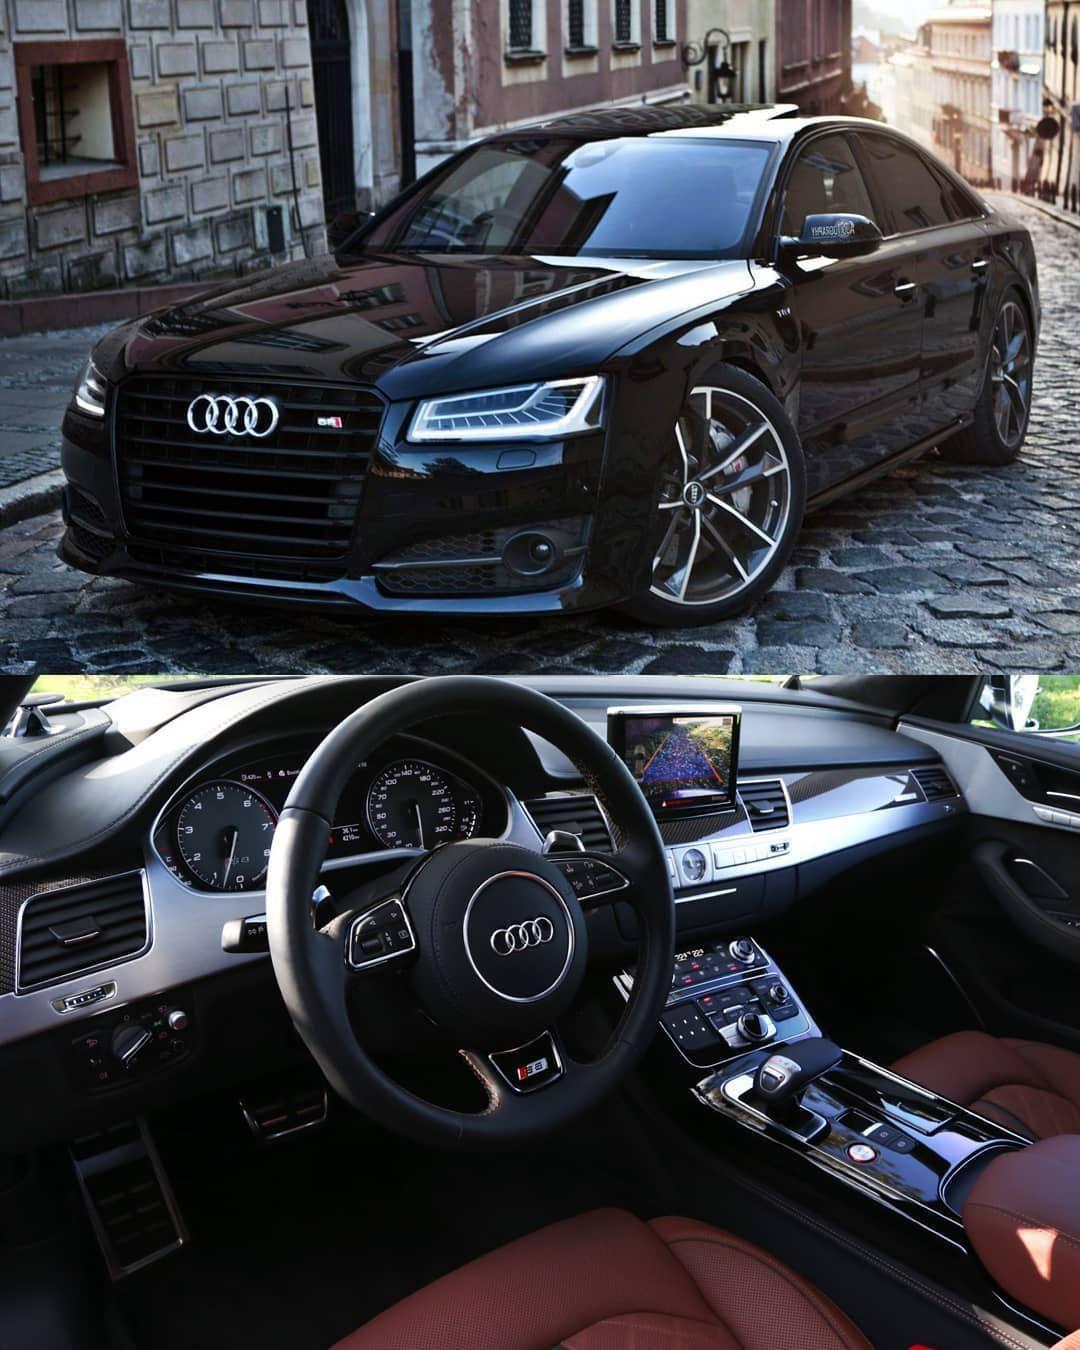 Cars Lifestyle Auf Instagram Audi S8 Plus Auditography Audi A8 A8l Luxury Cars Audi Audi Lux Cars